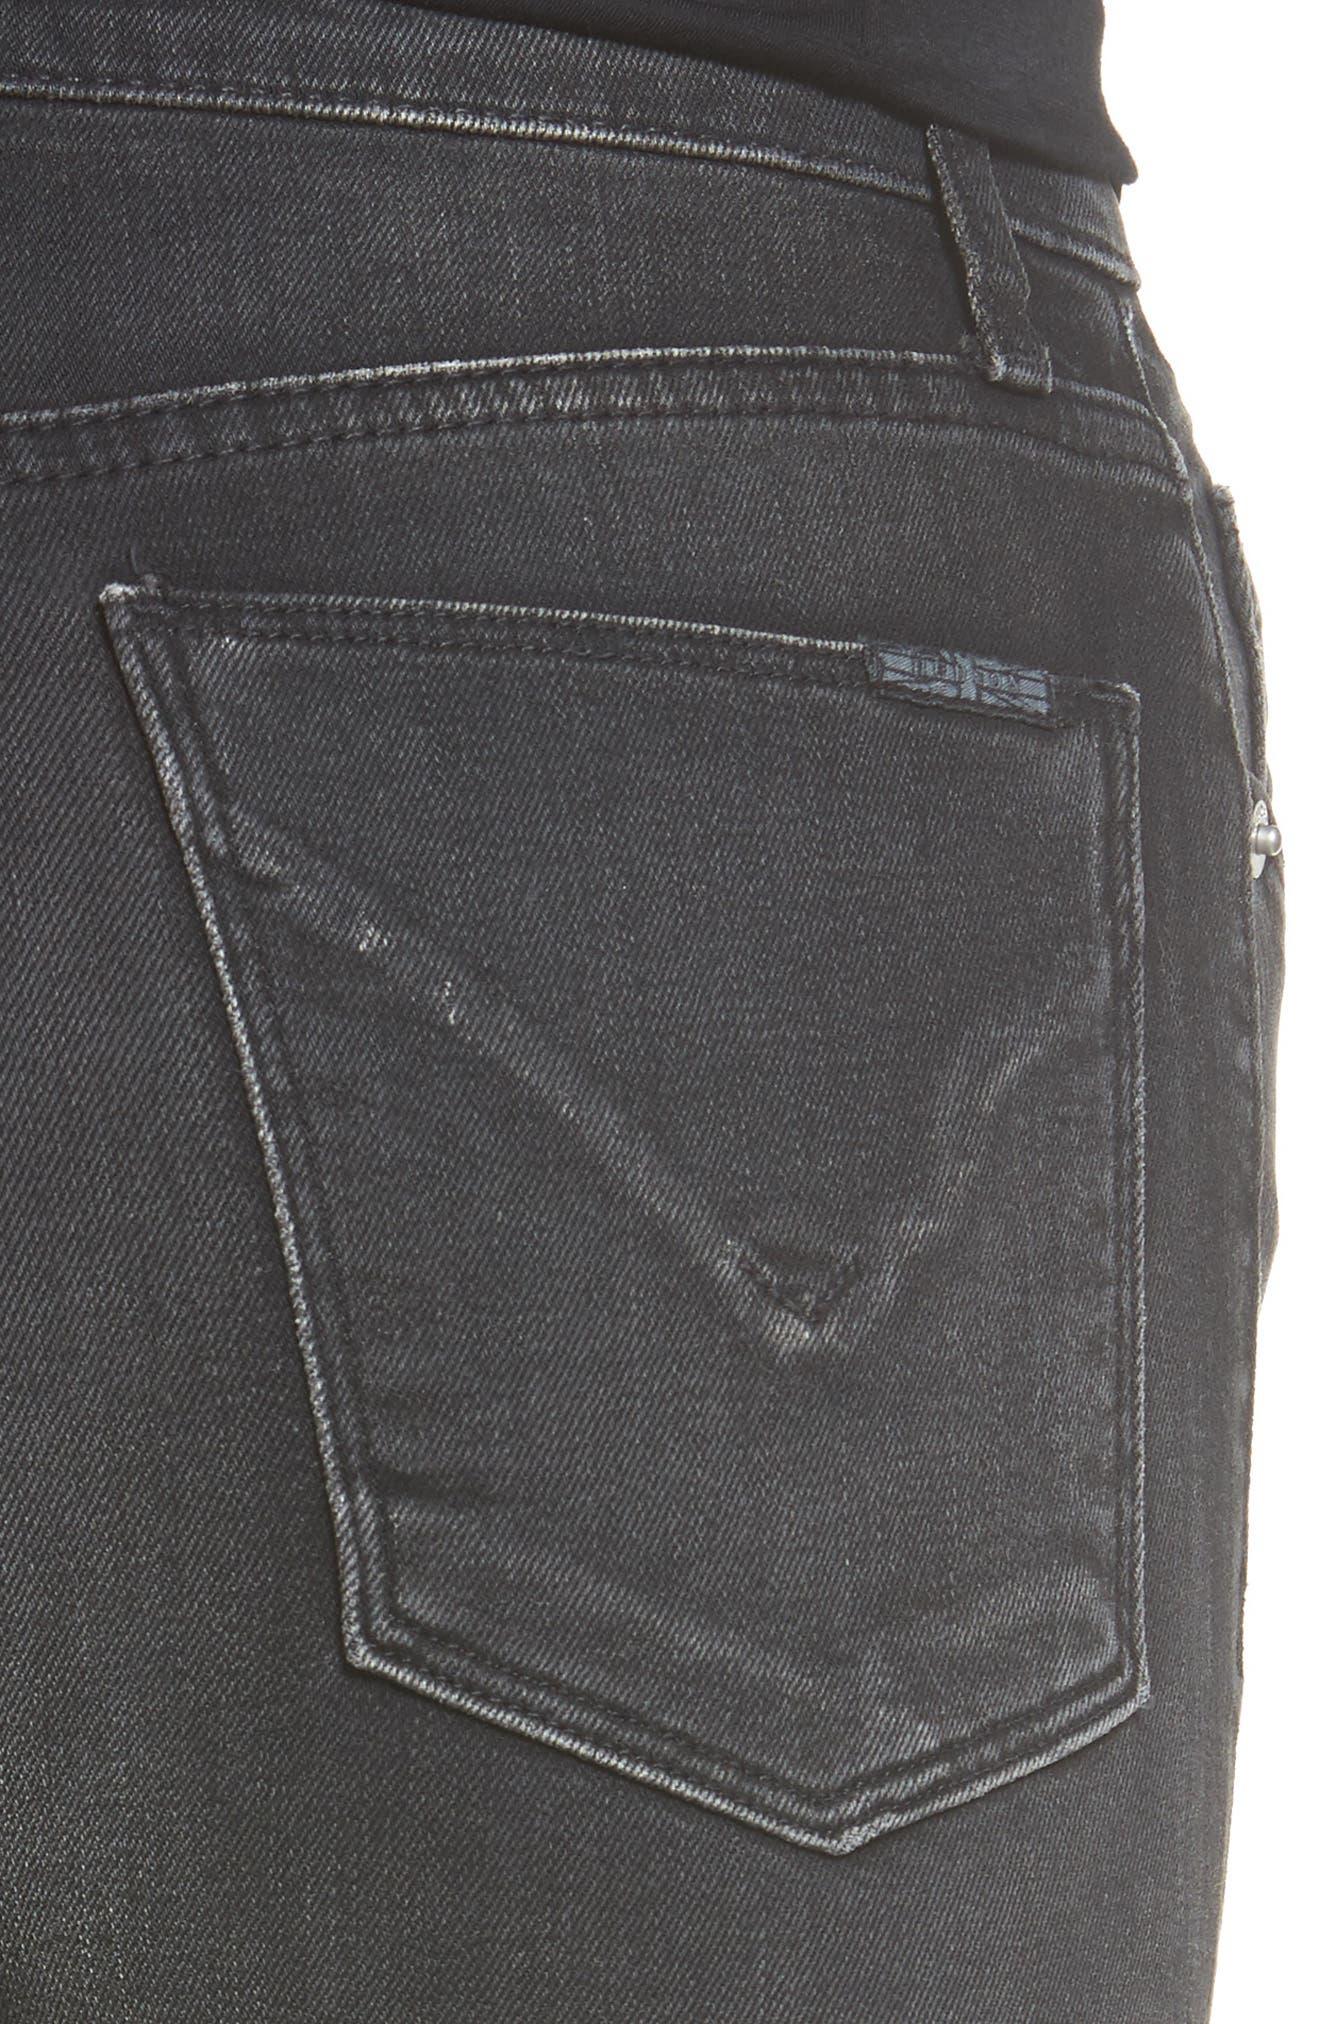 Heartbreaker High Waist Bootcut Jeans,                             Alternate thumbnail 5, color,